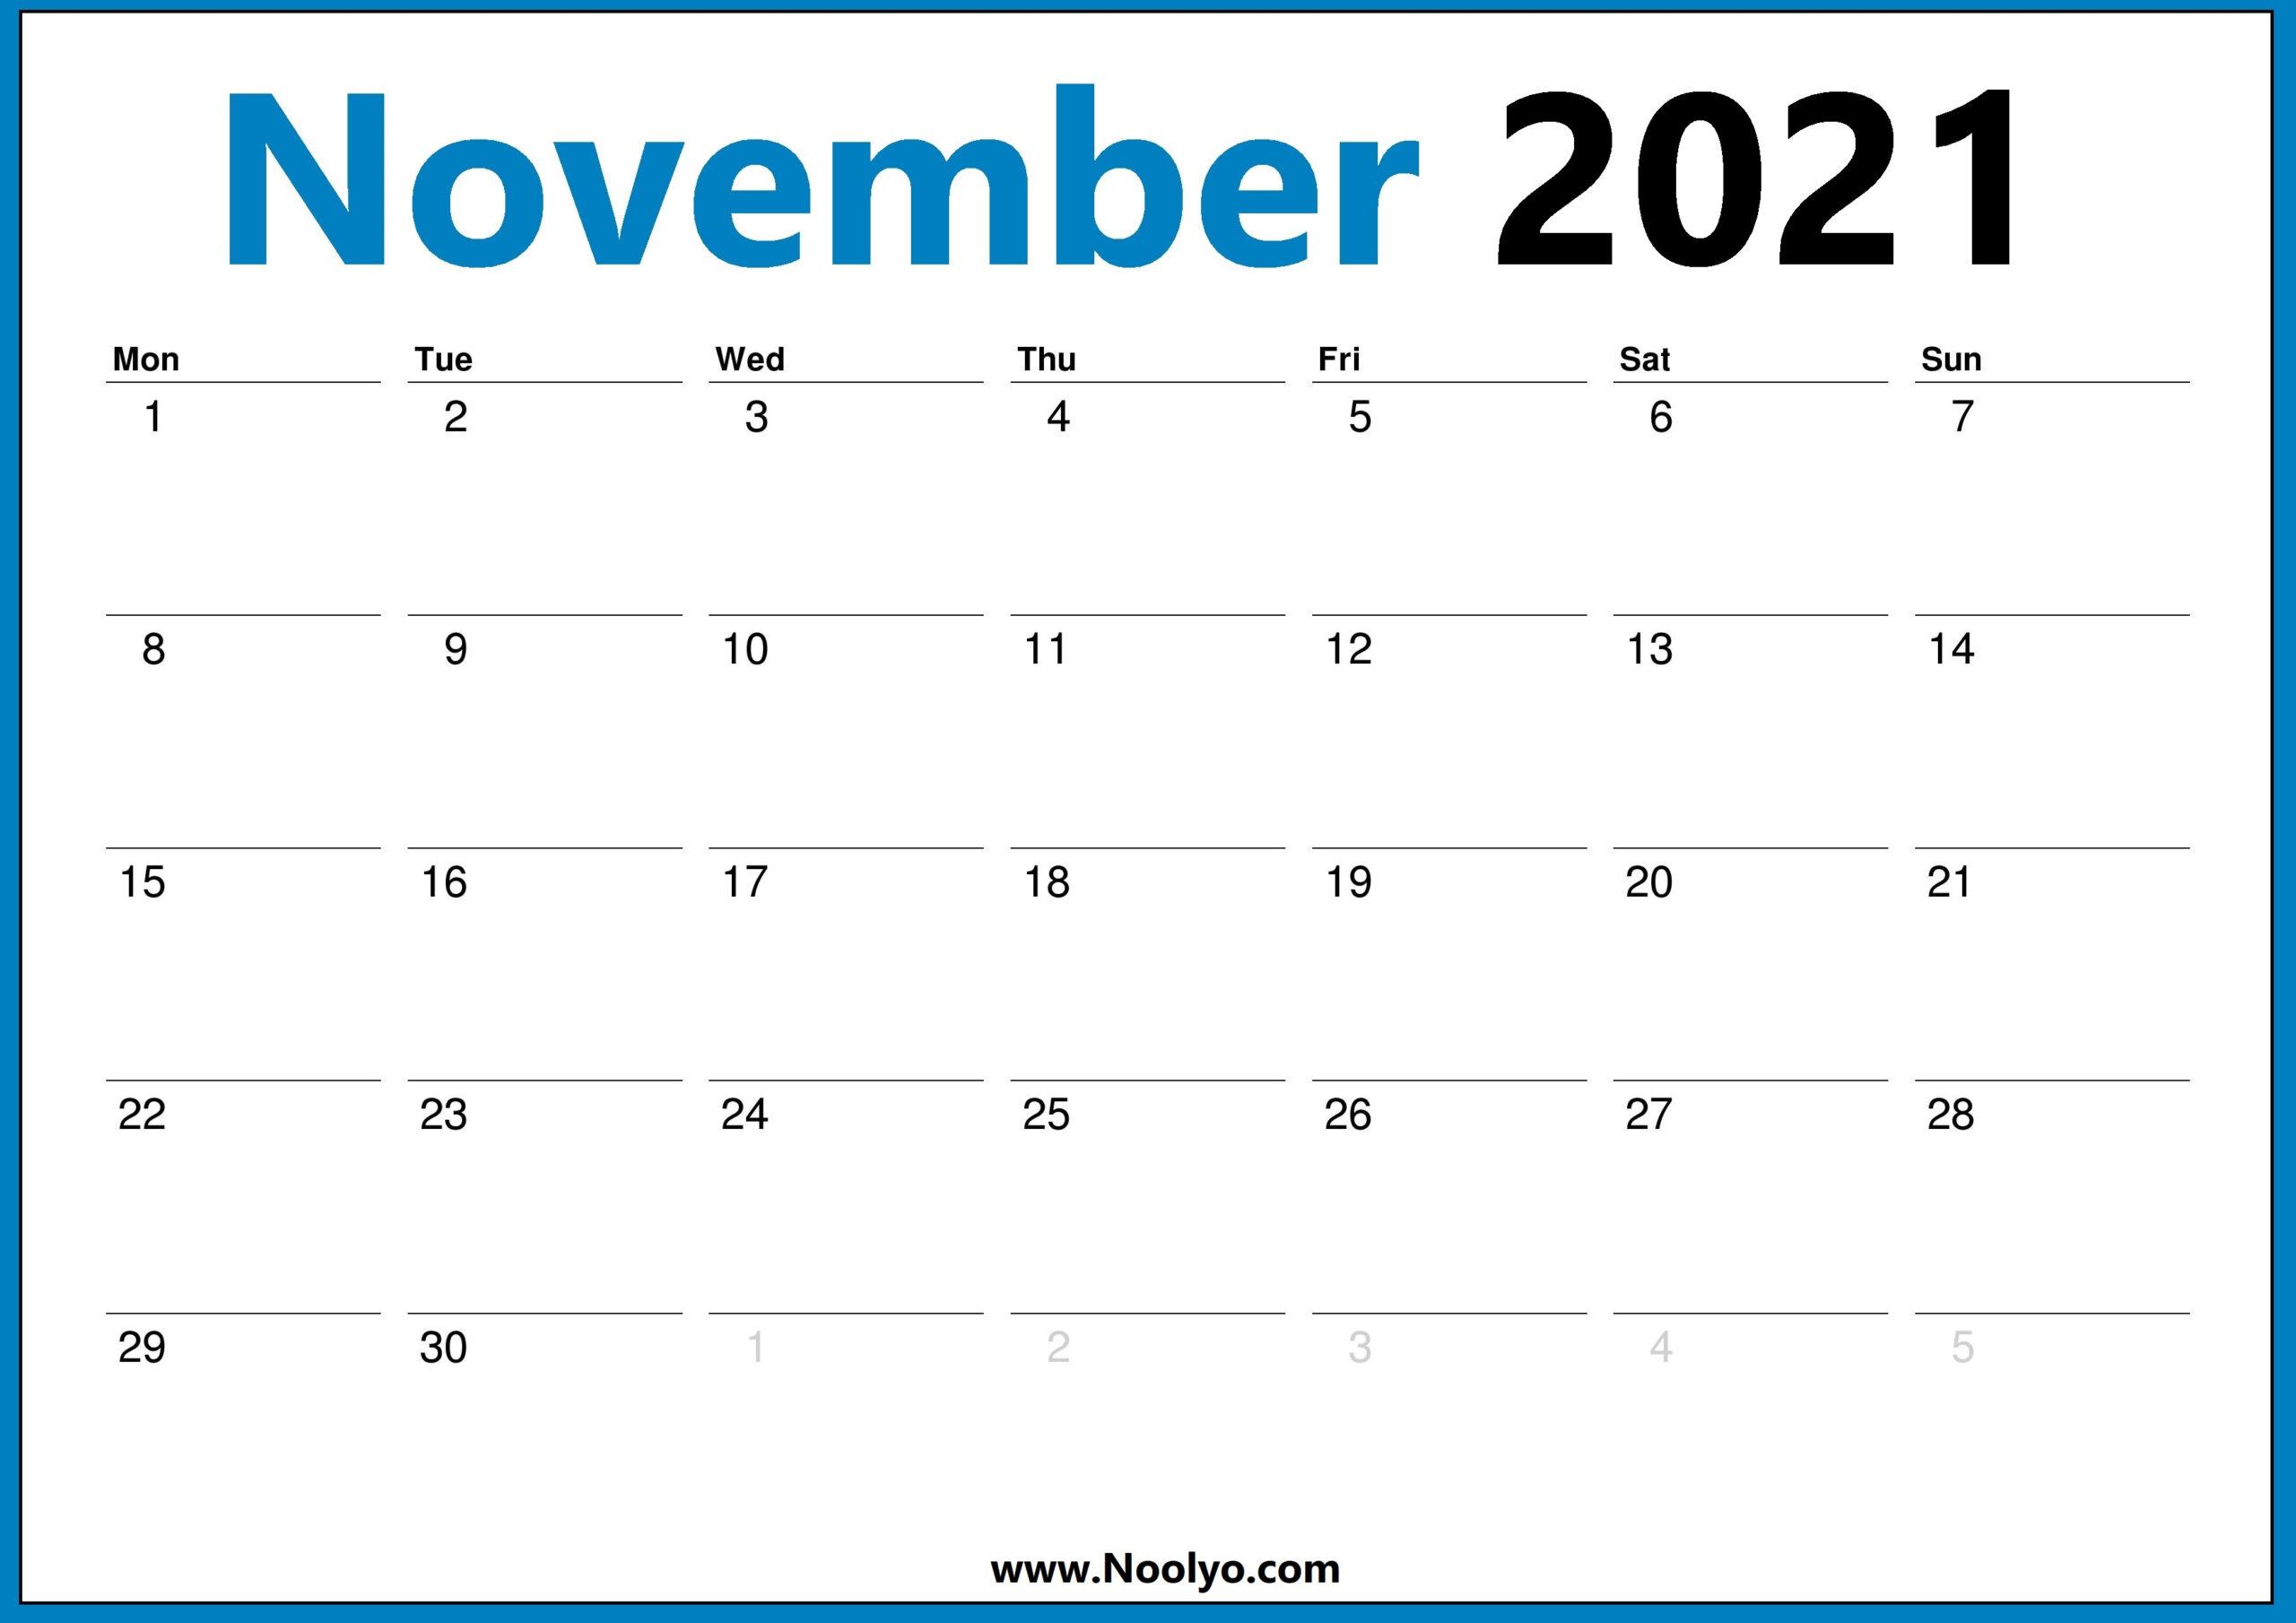 November 2021 Calendar Monday Start Hd - Noolyo